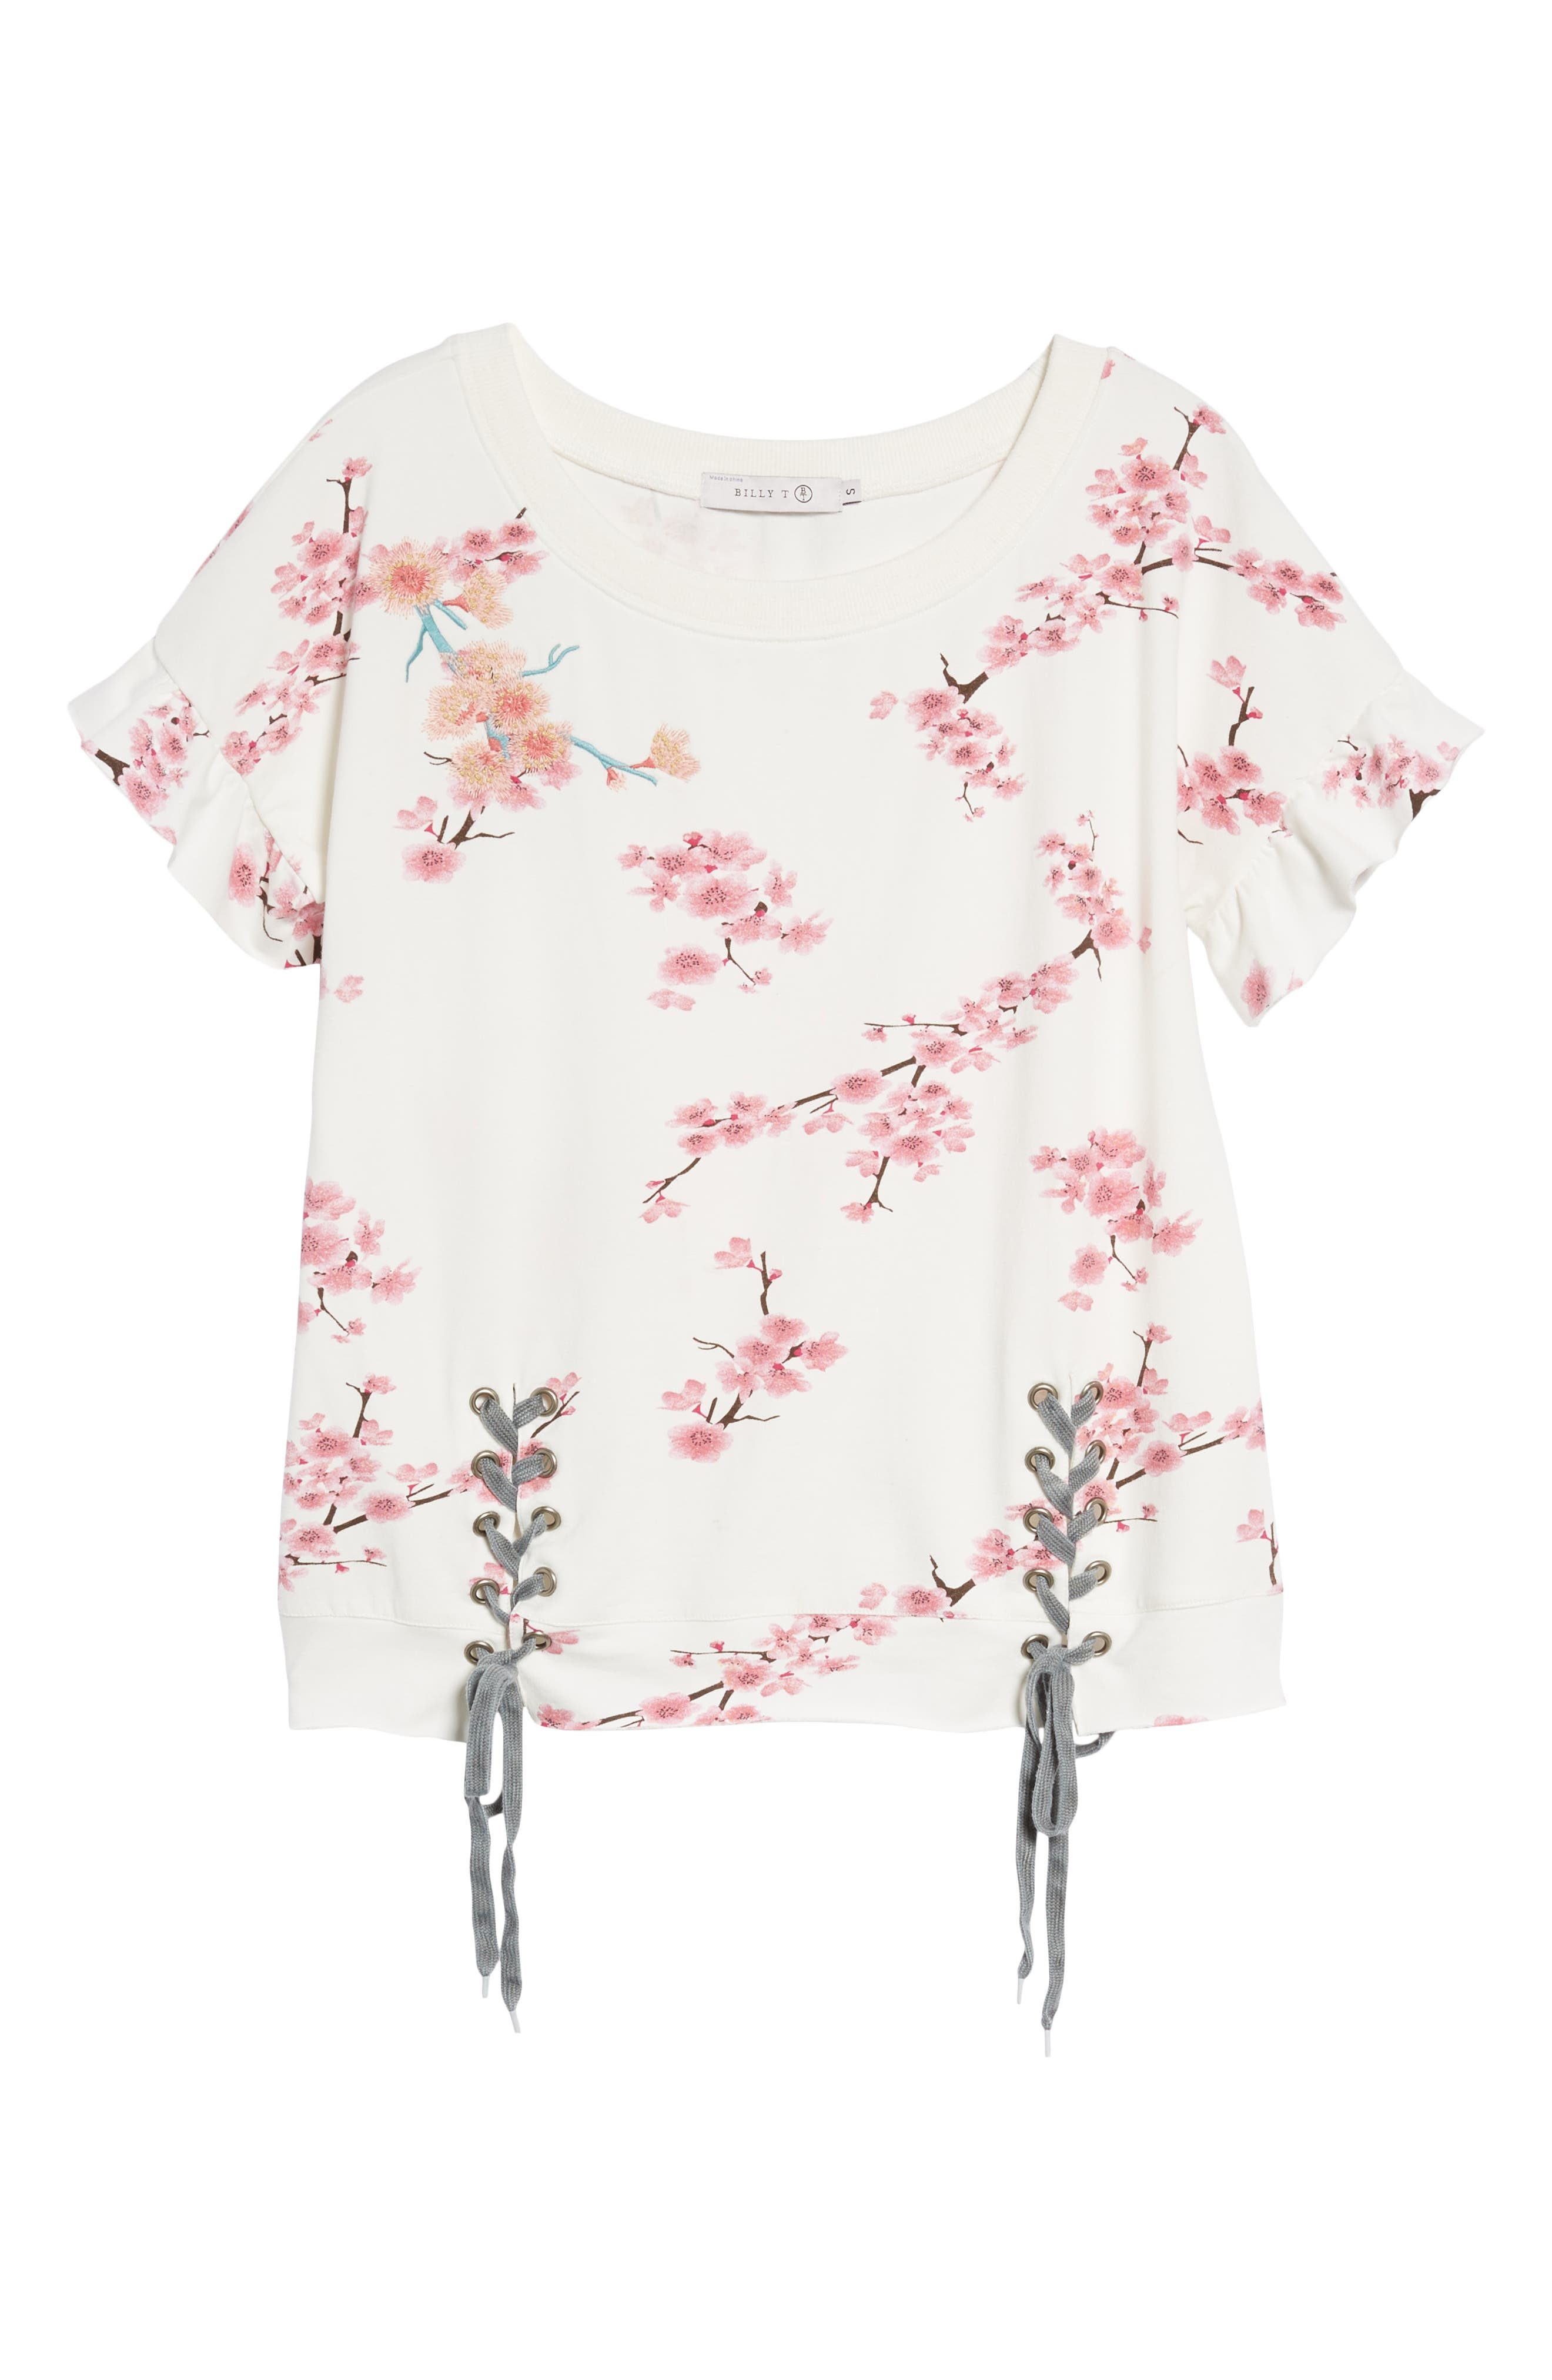 Cherry Blossom Short Sleeve Lace-Up Sweatshirt,                             Alternate thumbnail 6, color,                             WHITE CHERRY BLOSSOM